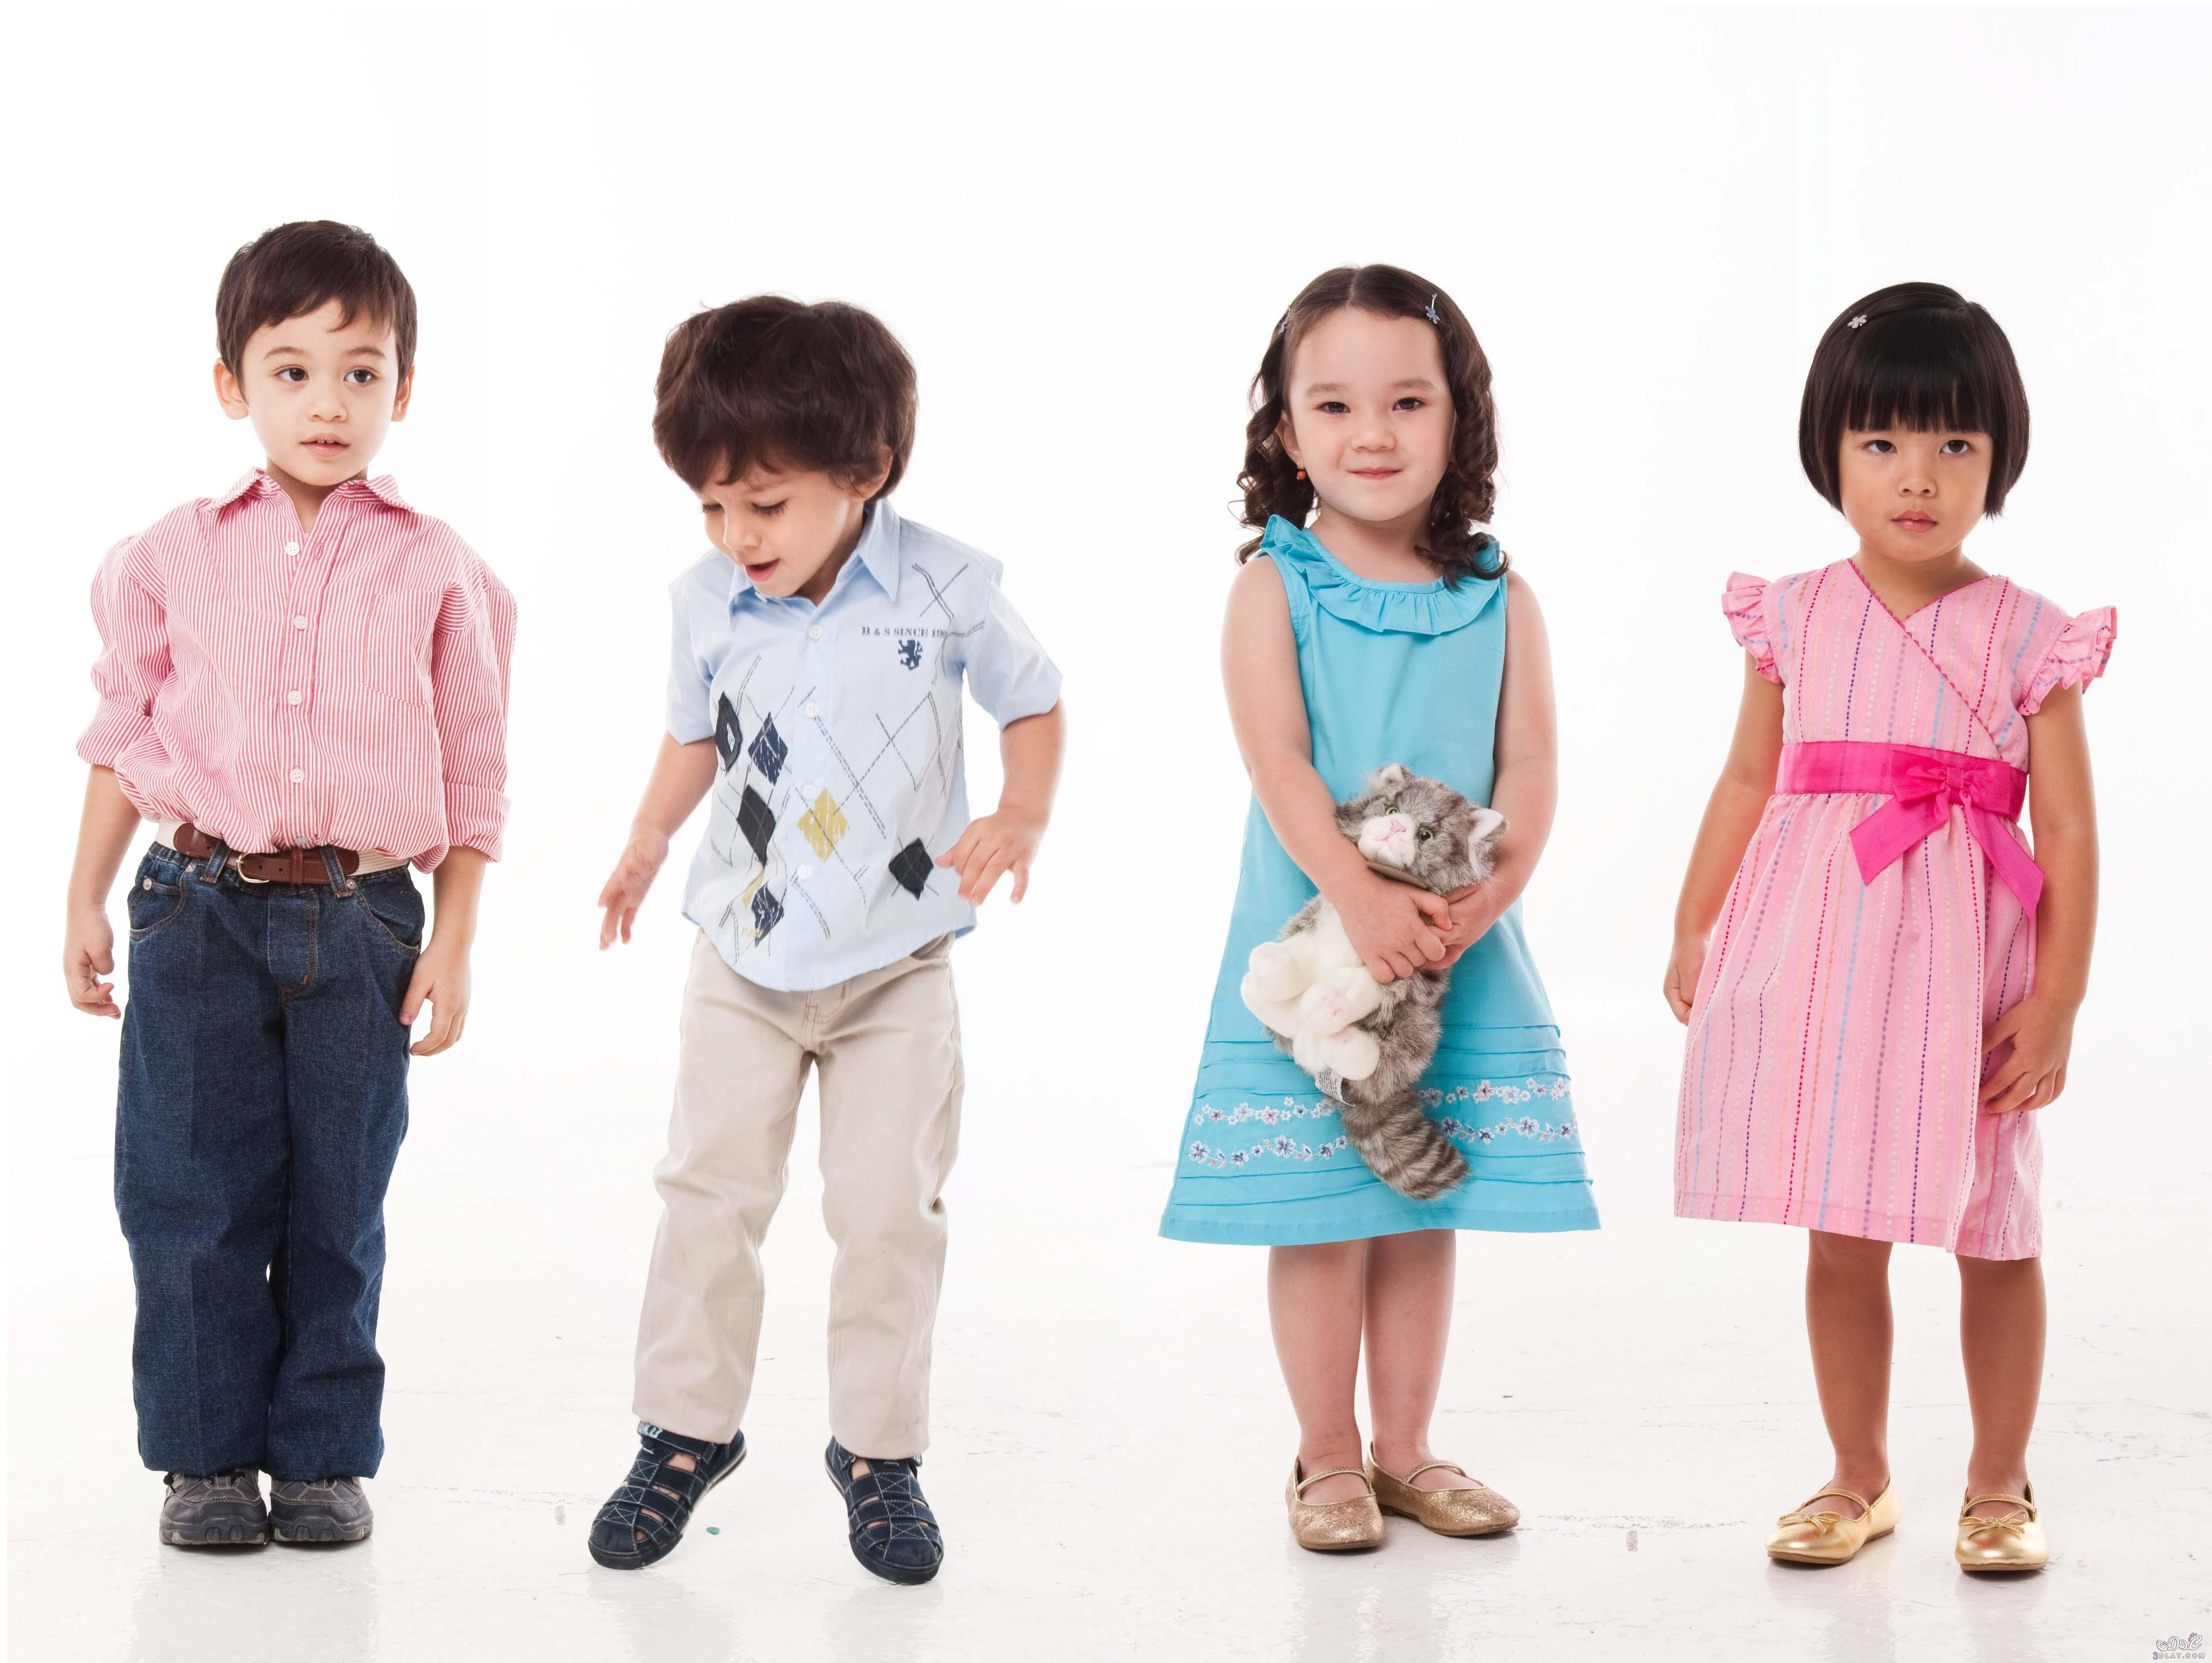 f9bc504d1 ازياء صيفى بناتى واولادى ازياء صيفى روعه ملابس أطفال كيوت   India ...